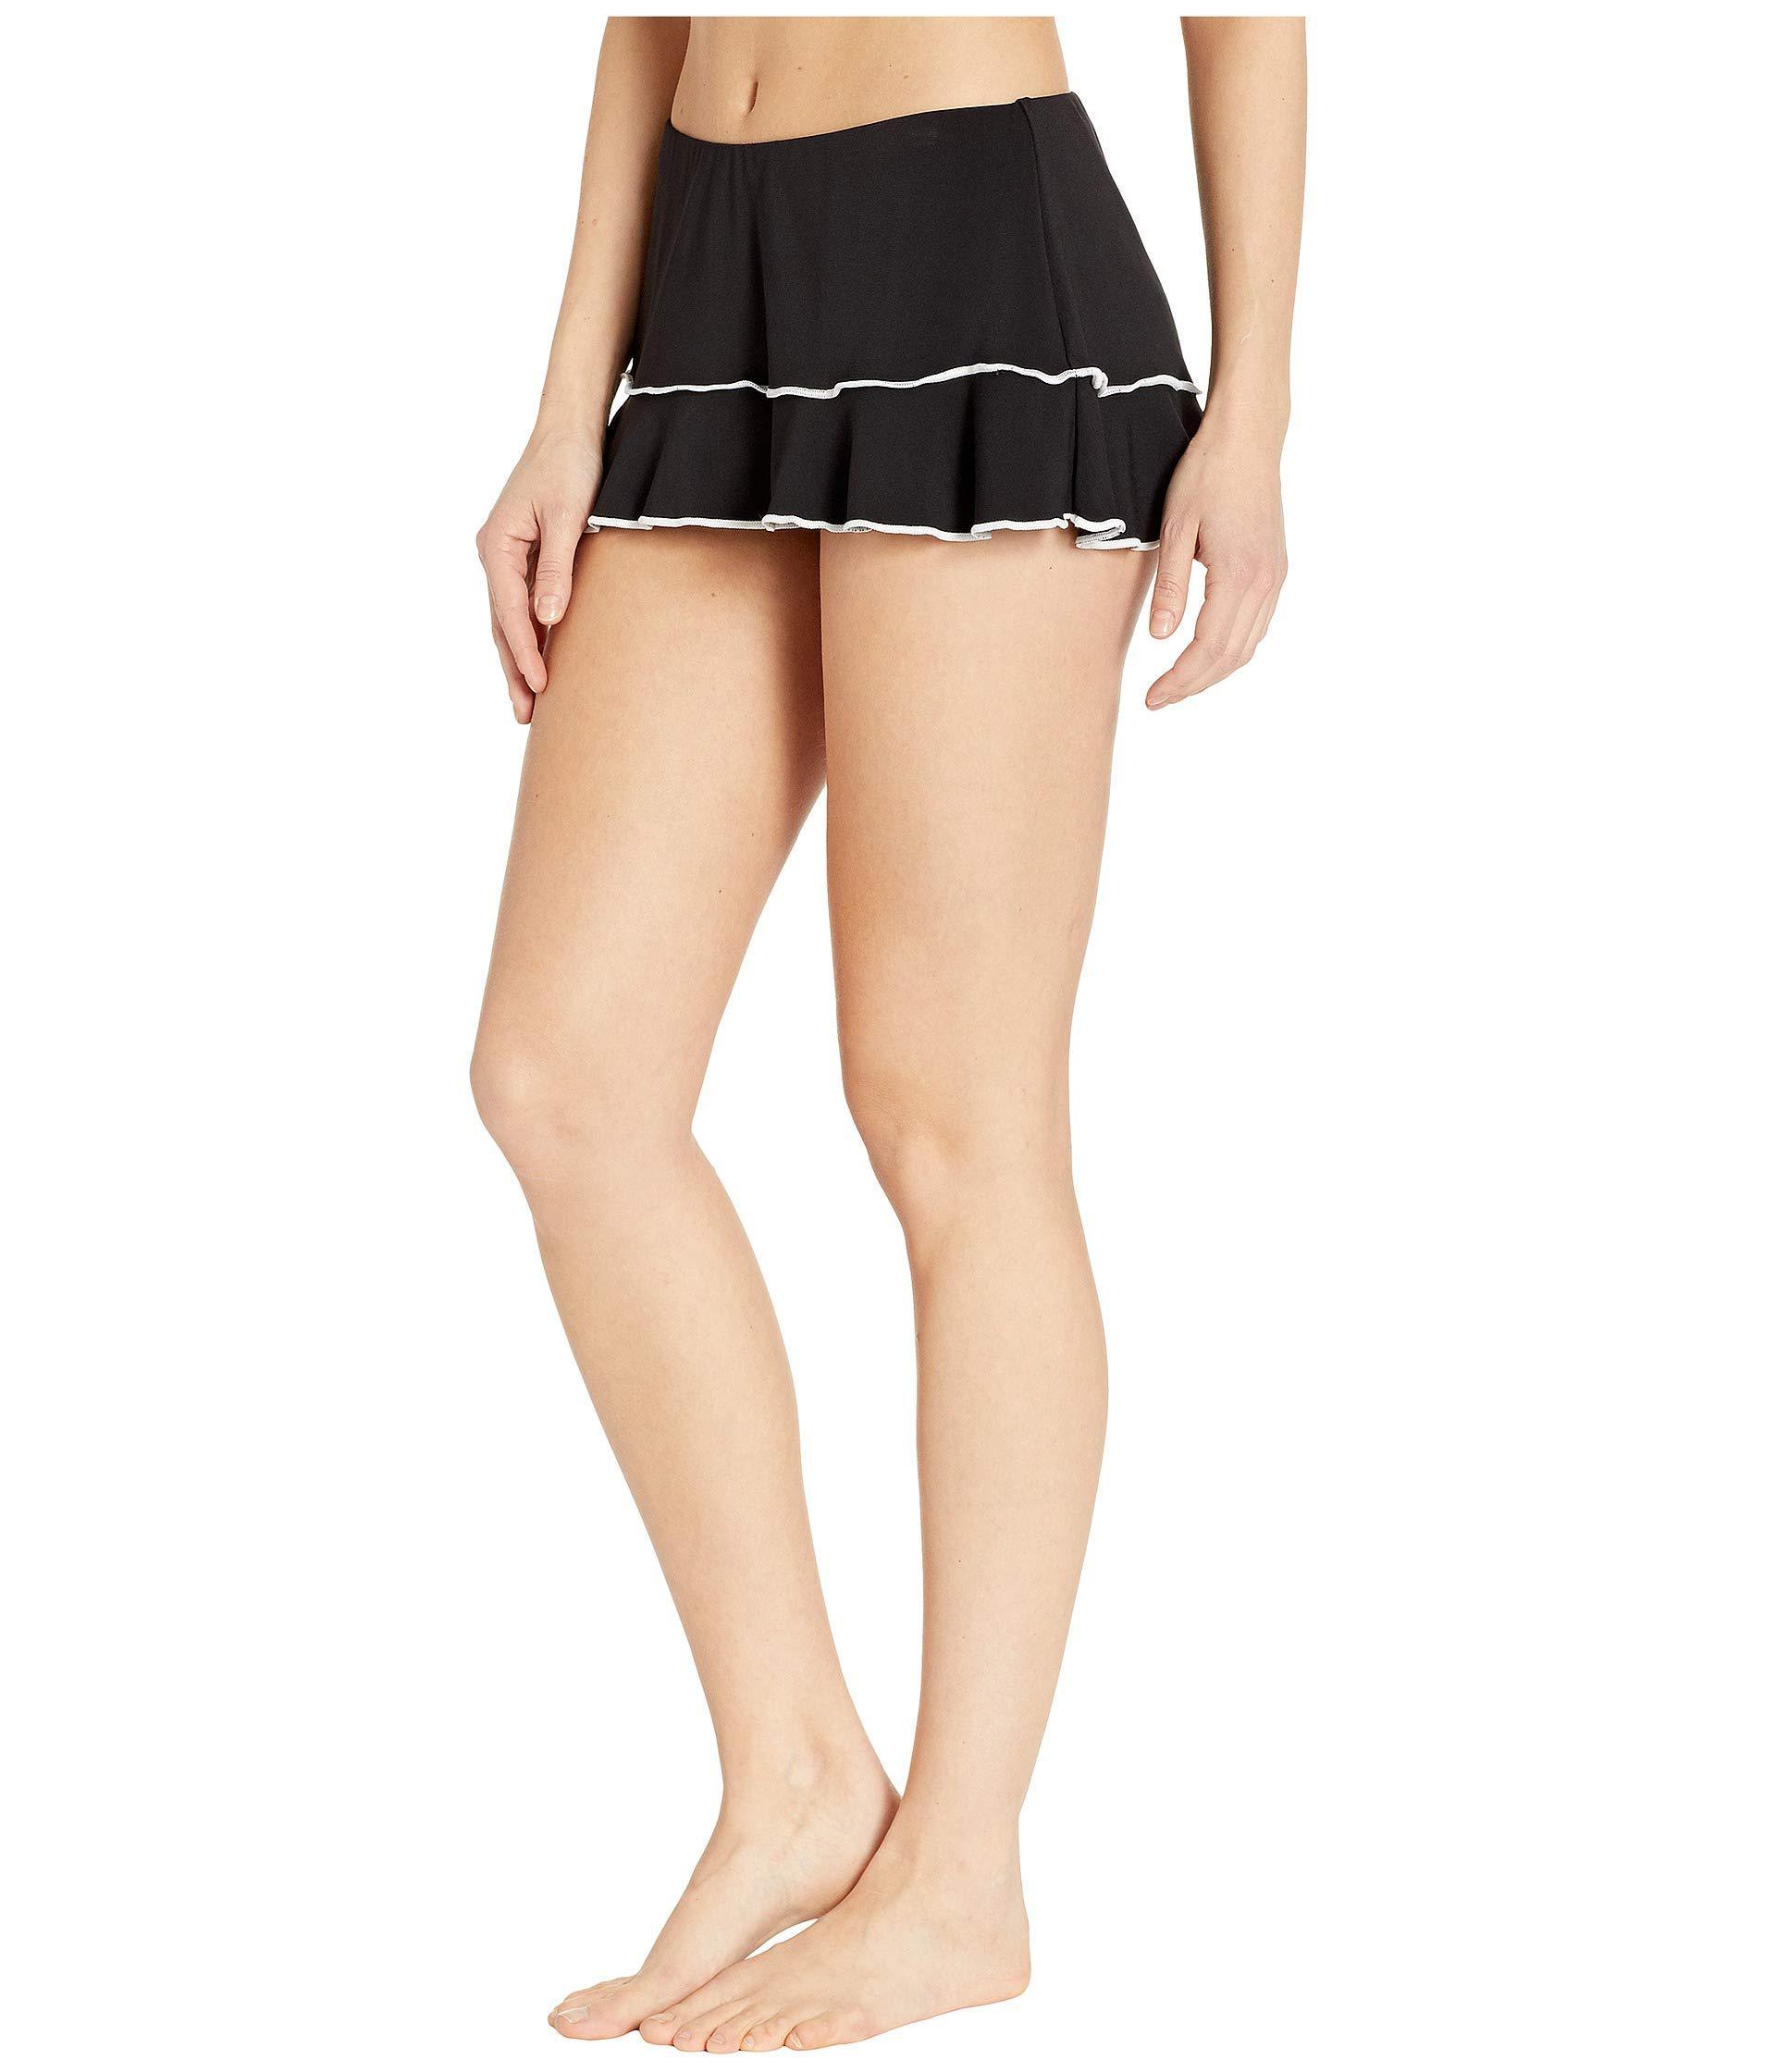 939eb2e874307 Lyst - Robin Piccone Malia Ruffle Skirted Bottoms (black white) Women s  Swimwear in Black